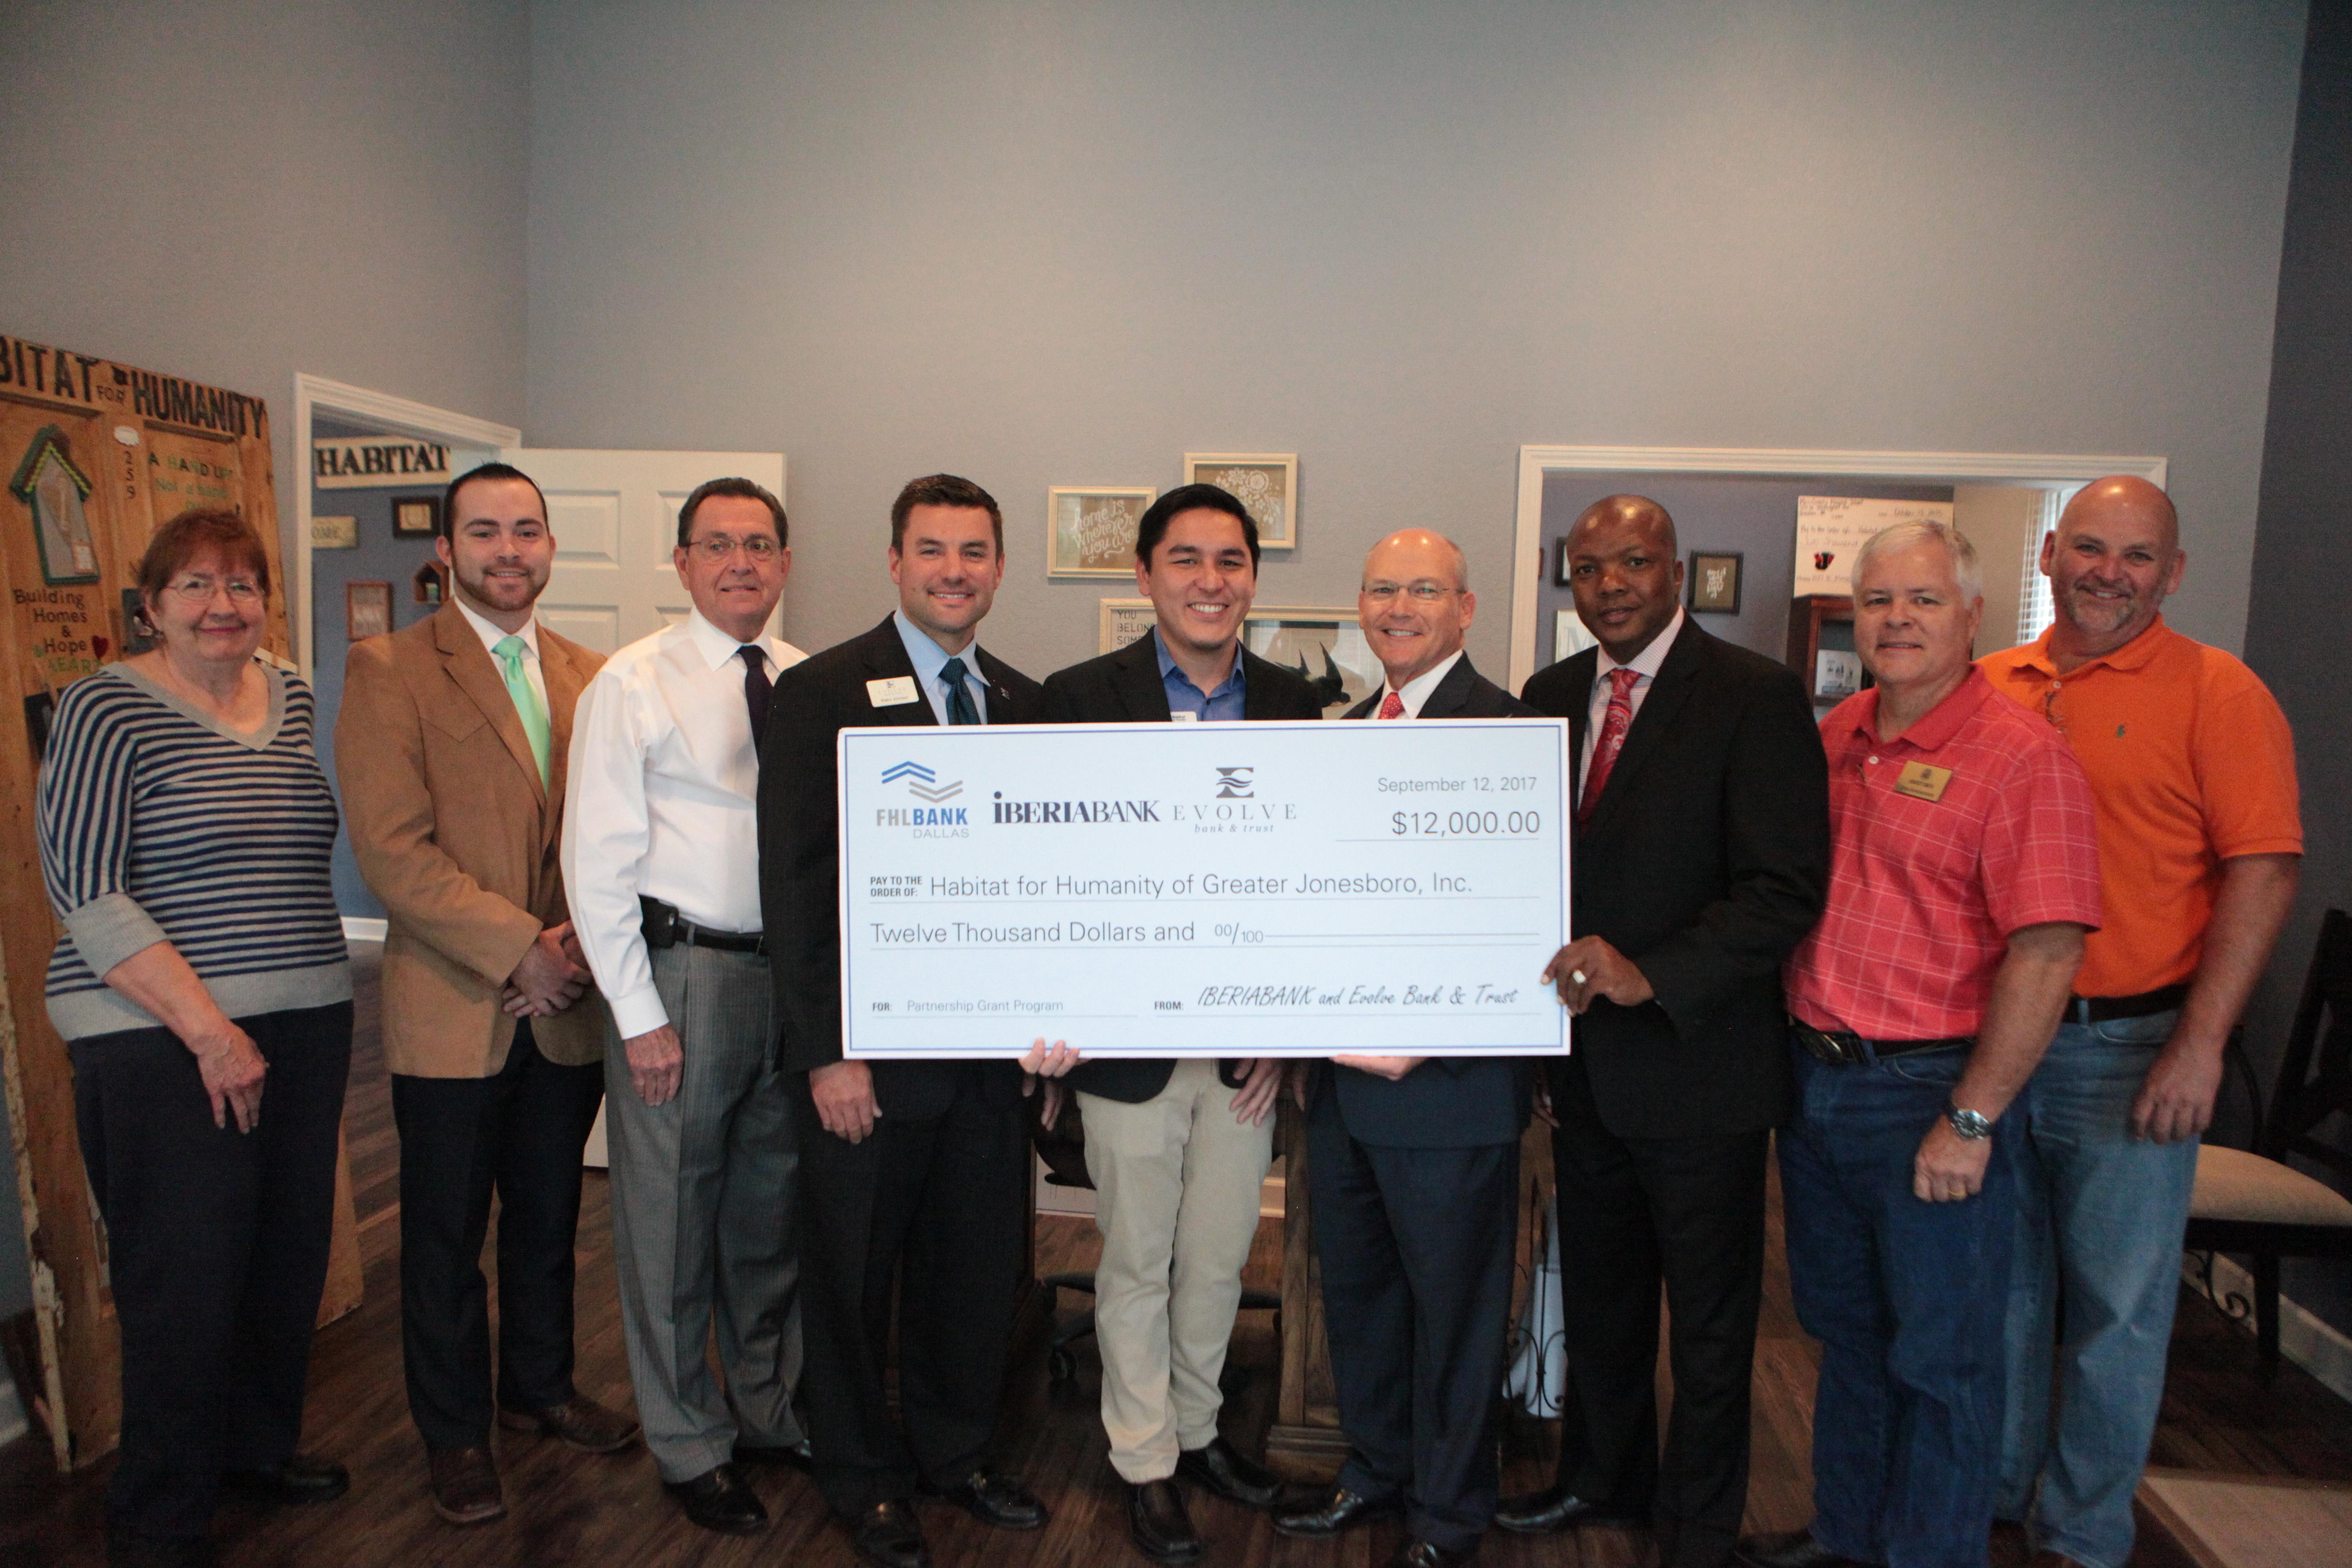 IBERIABANK Evolve Bank and Trust FHLB Dallas Award K to